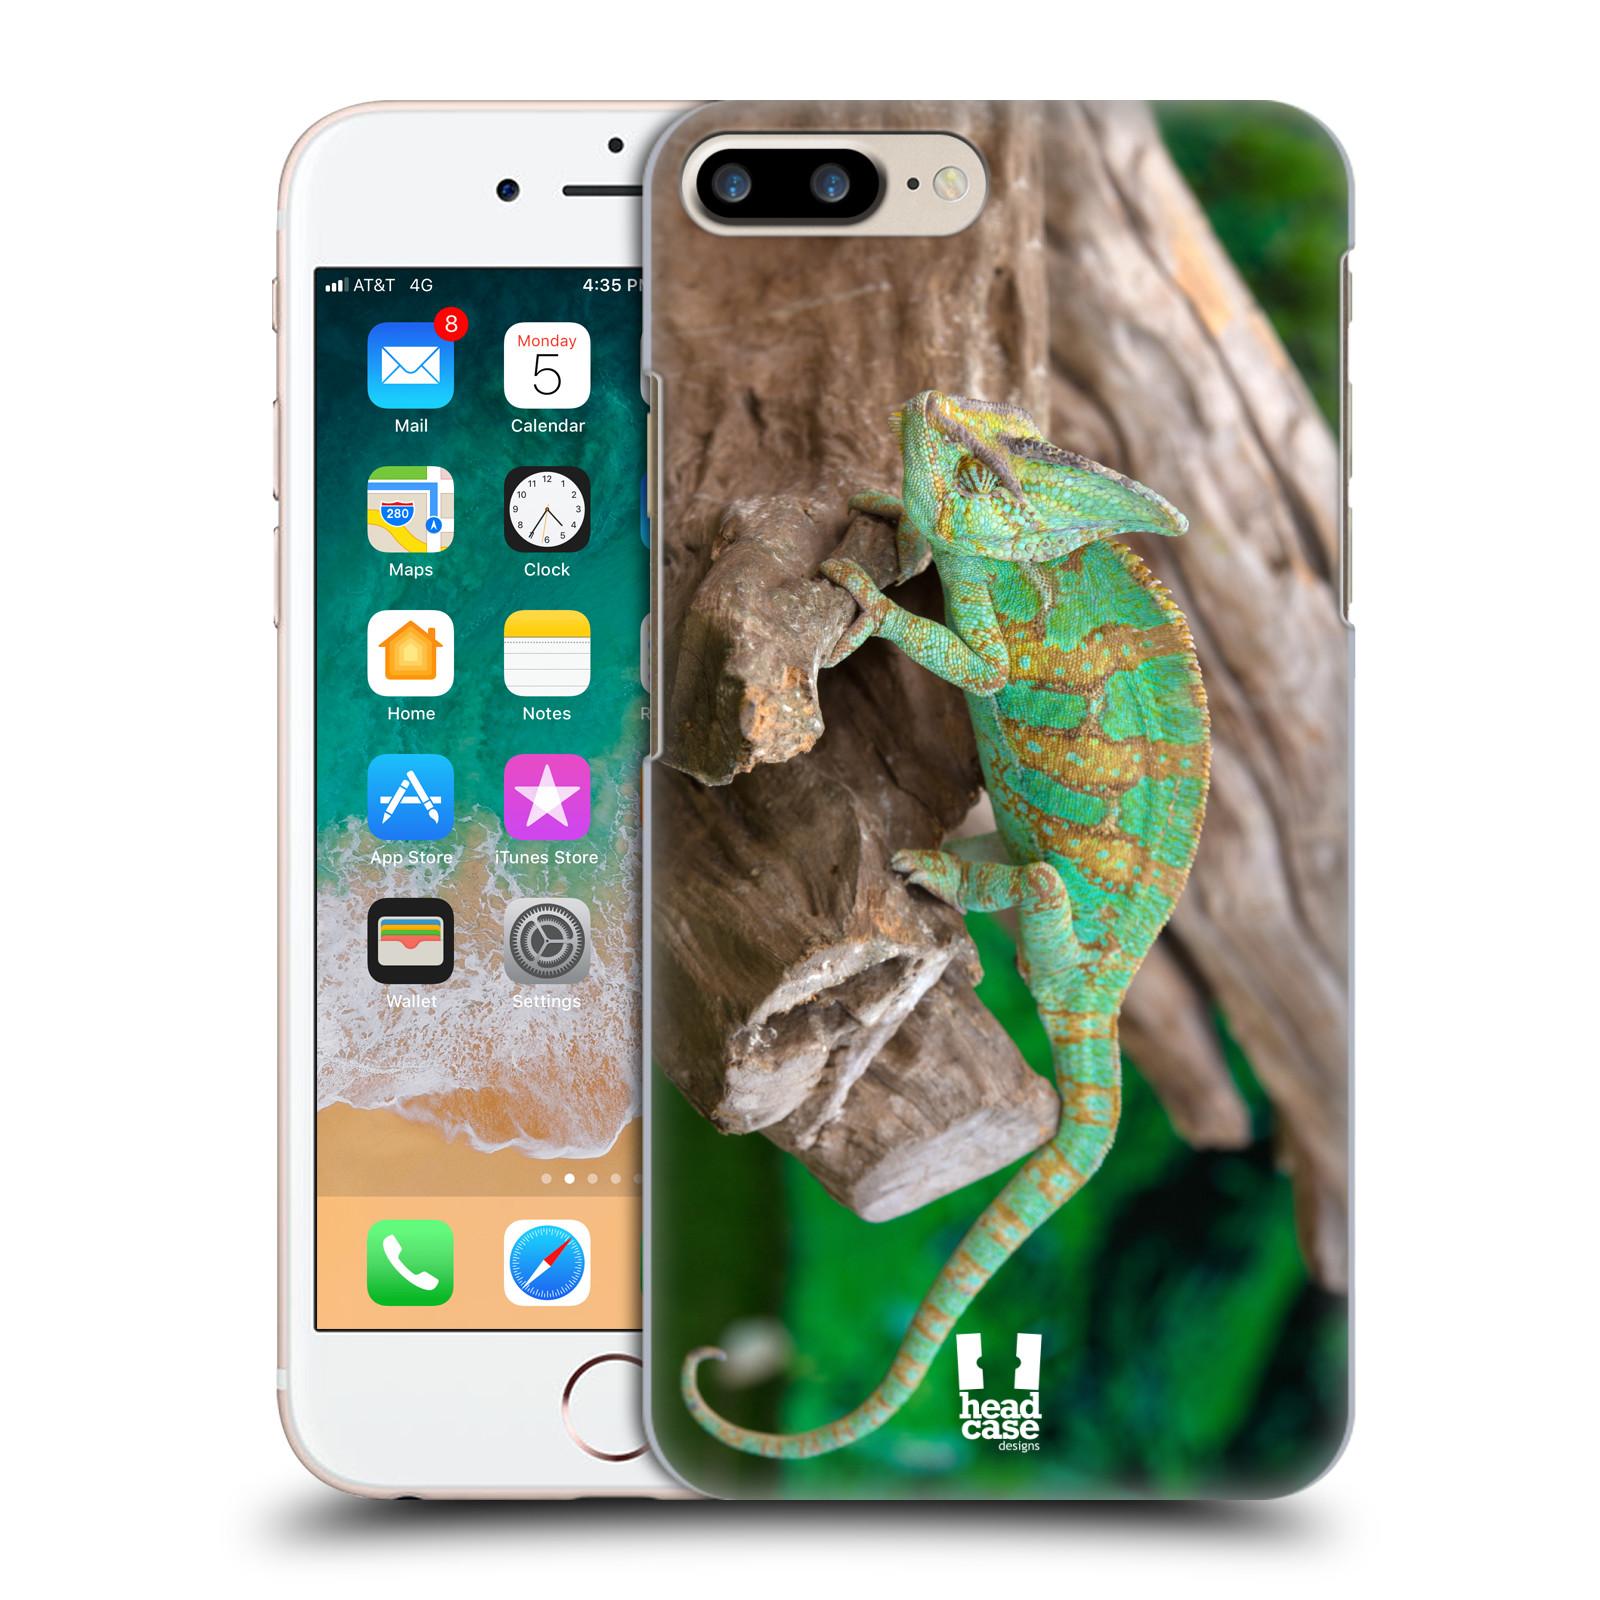 HEAD CASE plastový obal na mobil Apple Iphone 7 PLUS vzor slavná zvířata foto chameleon